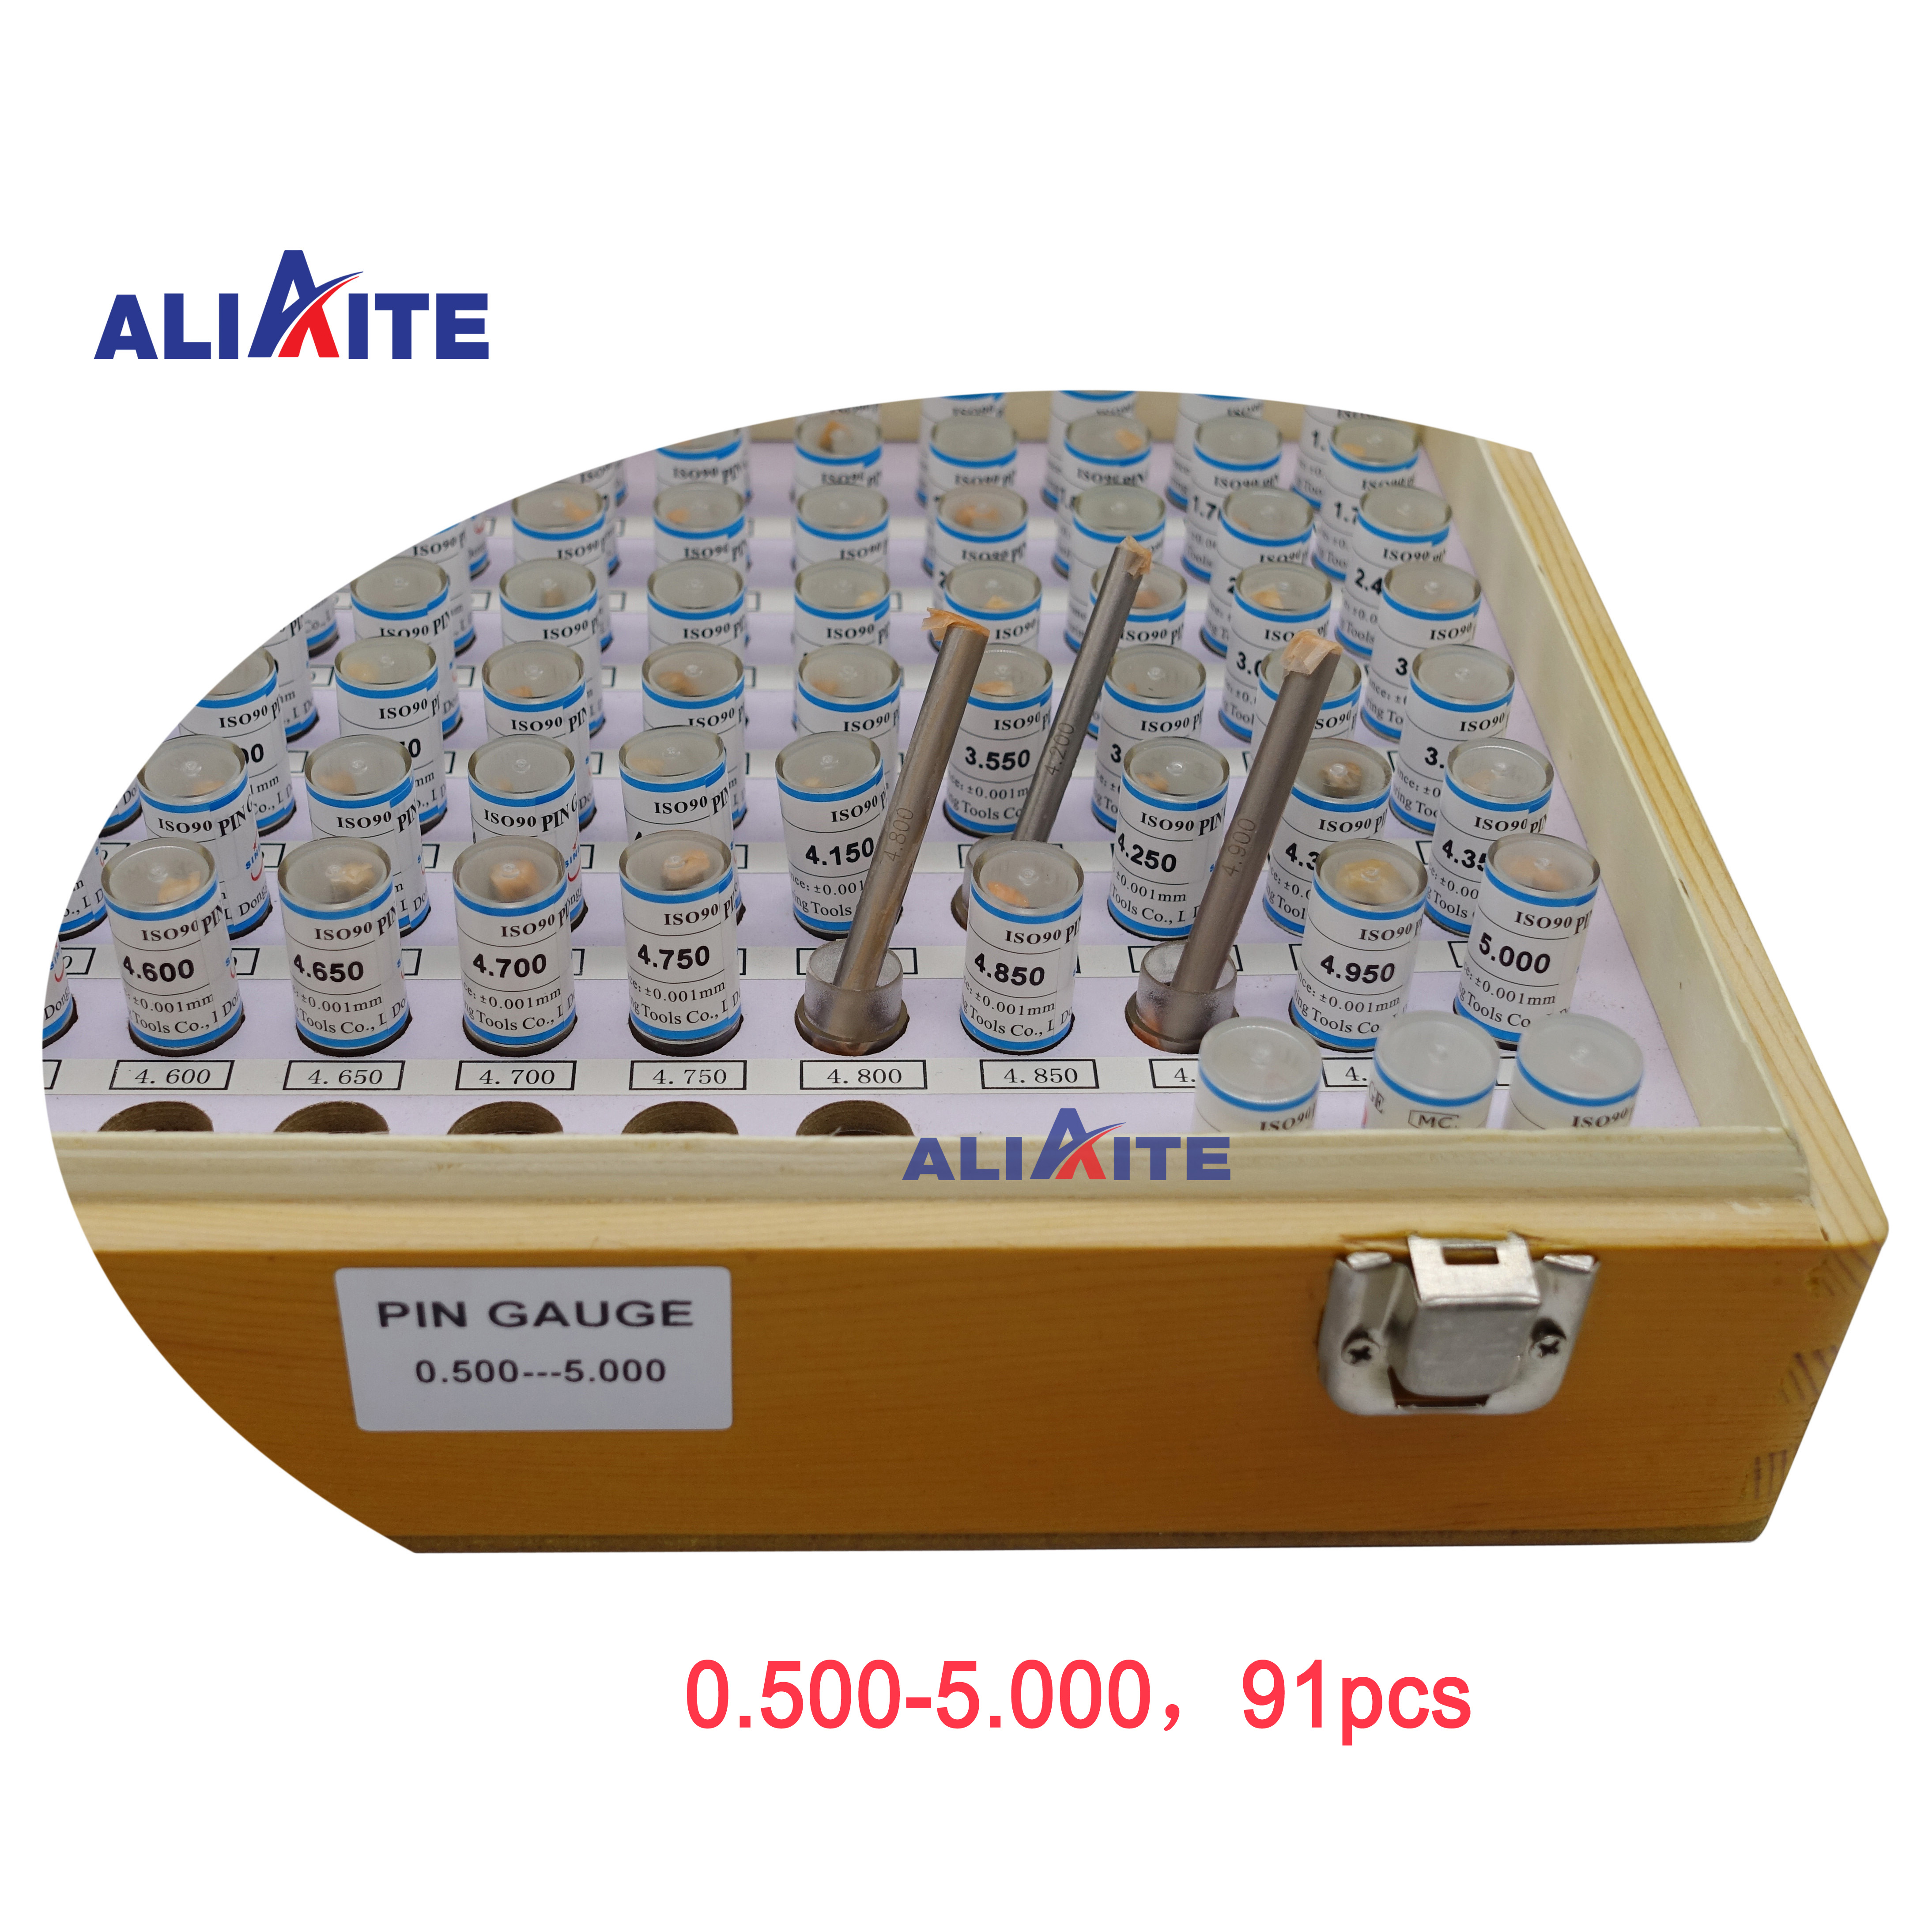 Pin Gauge Set 0.500-5.000(step: 0.05,91pcs)   Aliaite Pin Plug Gauge Set